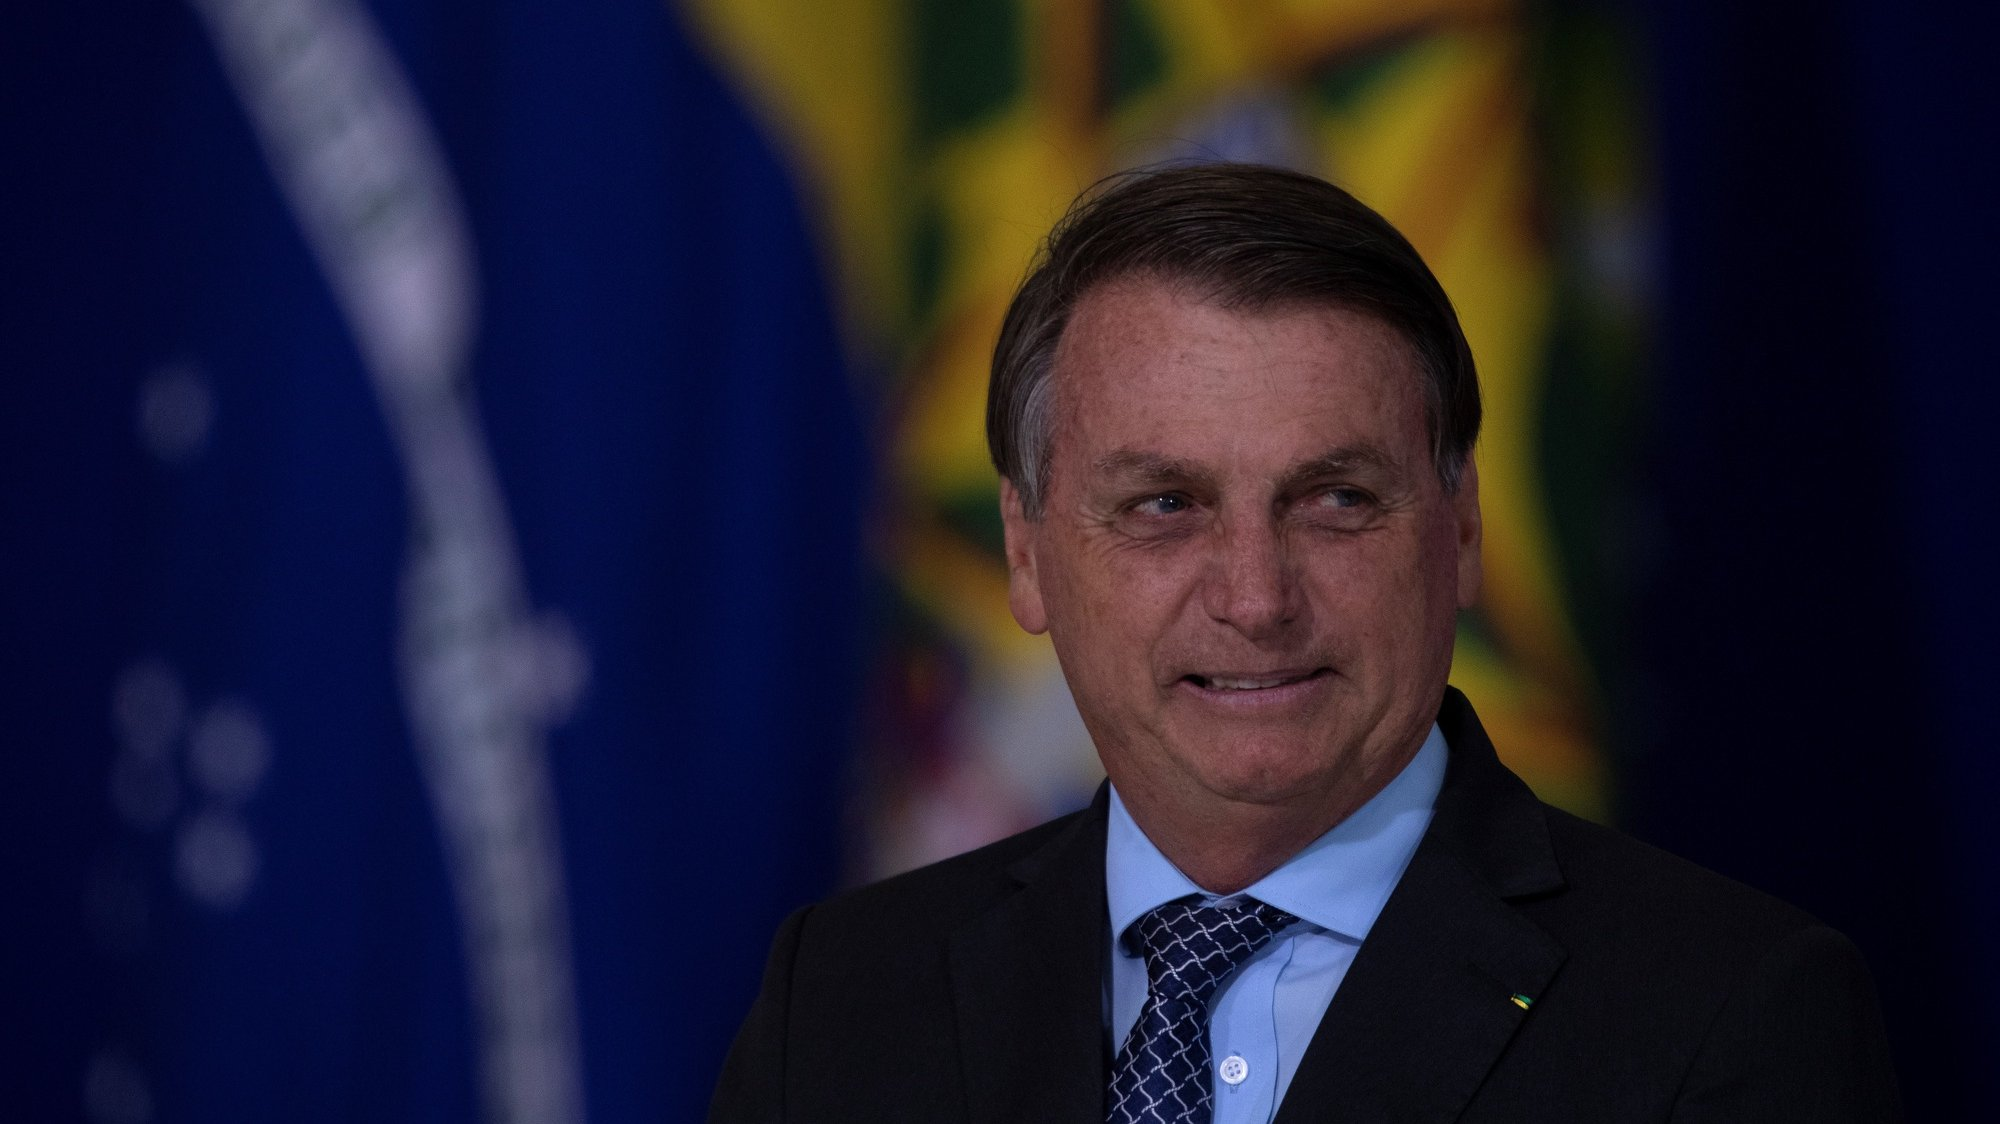 epa08810541 President of Brazil Jair Bolsonaro participates in the launch of the Alliance for Volunteering and the Friends of the Country Award, in Brasilia, Brazil, 09 November 2020.  EPA/Joedson Alves